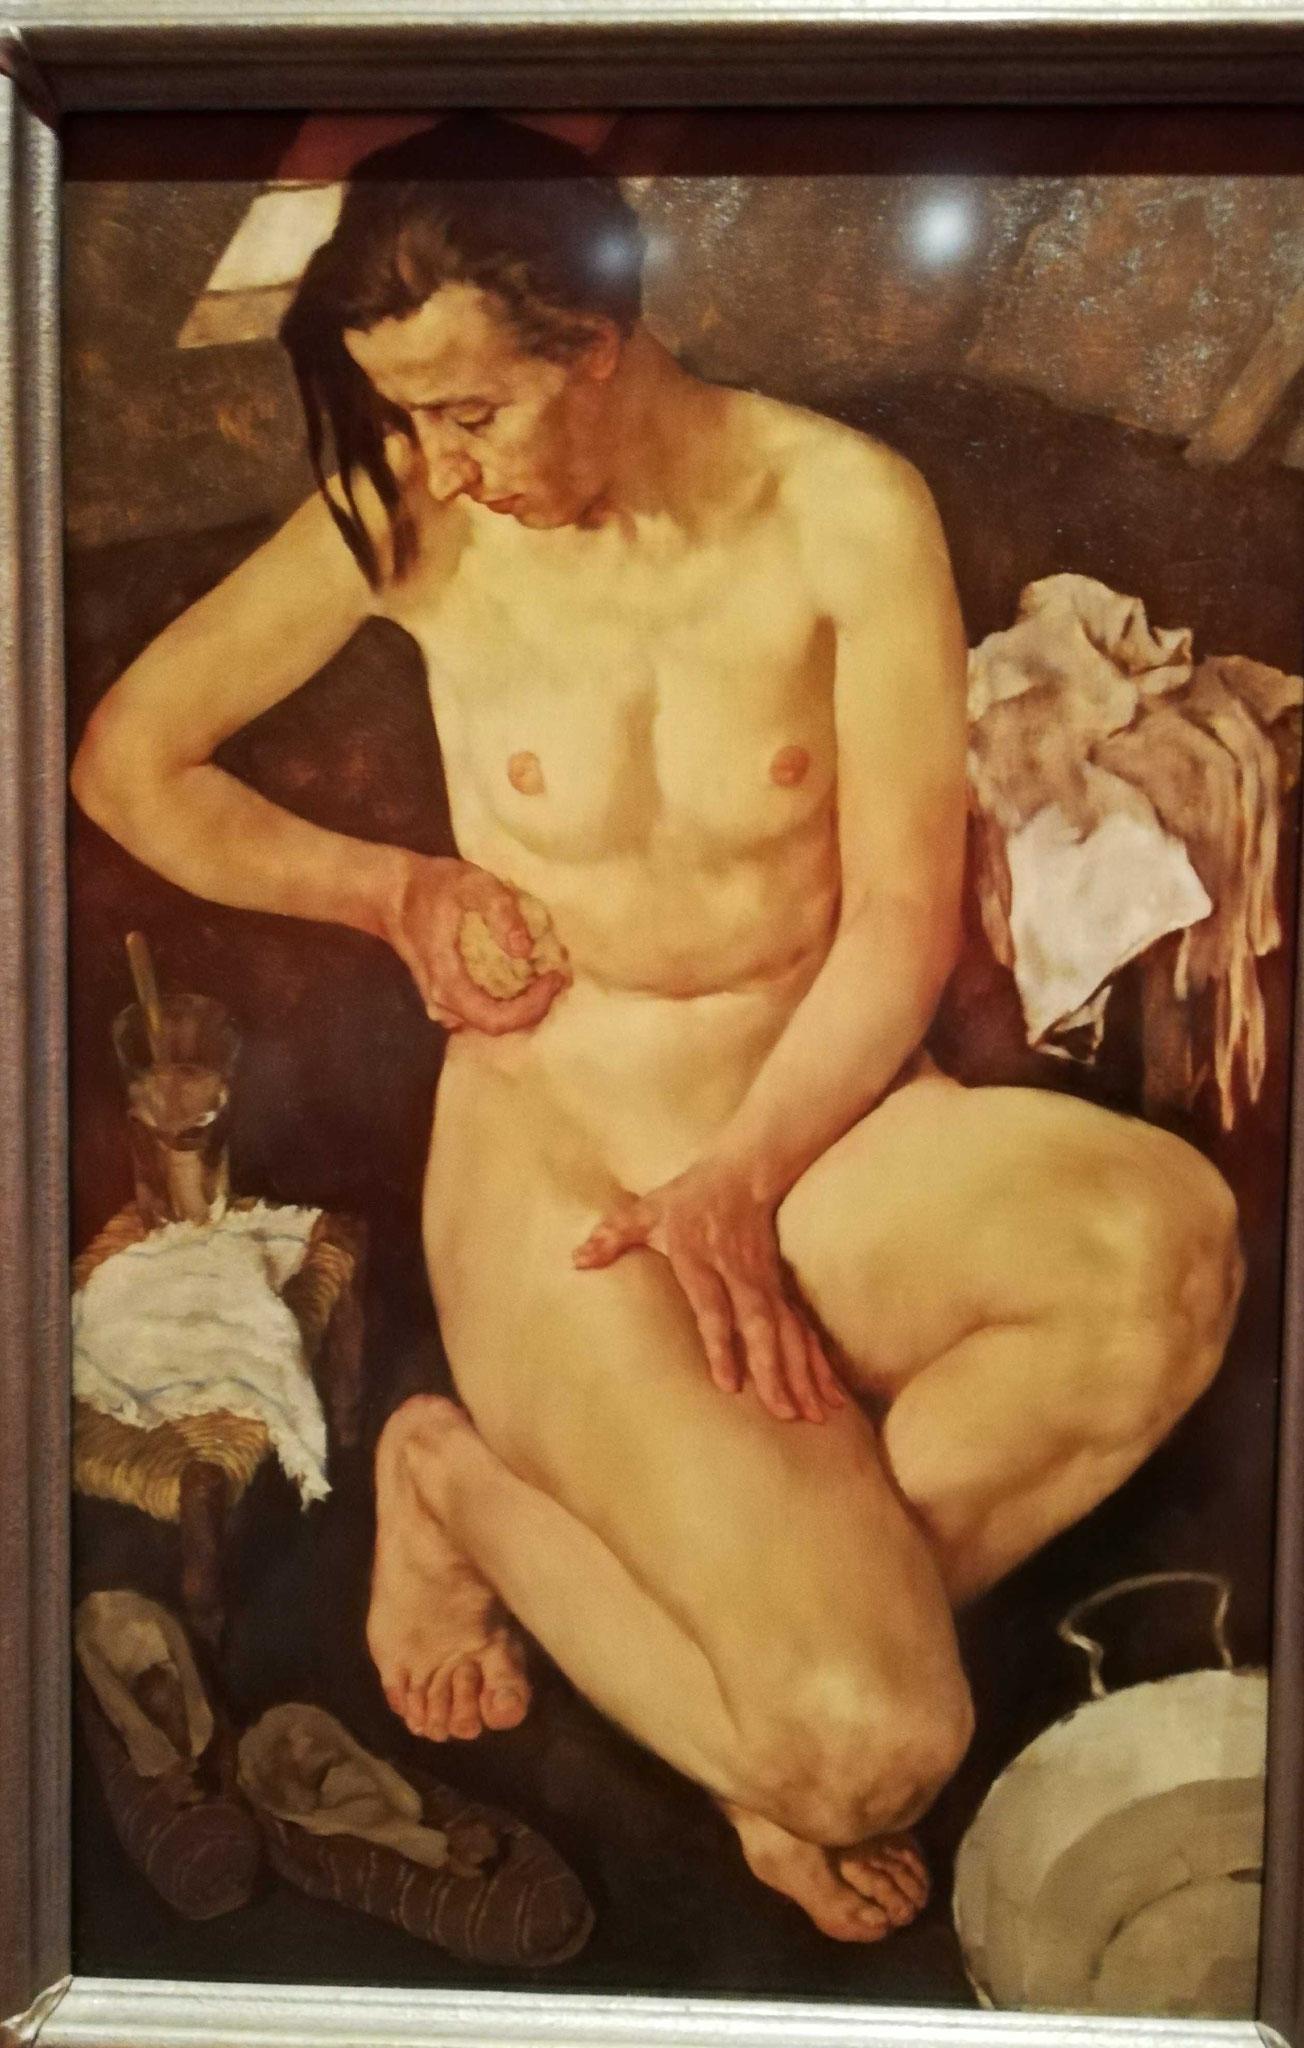 Lotte Laserstein, Morgentoilette, 1930